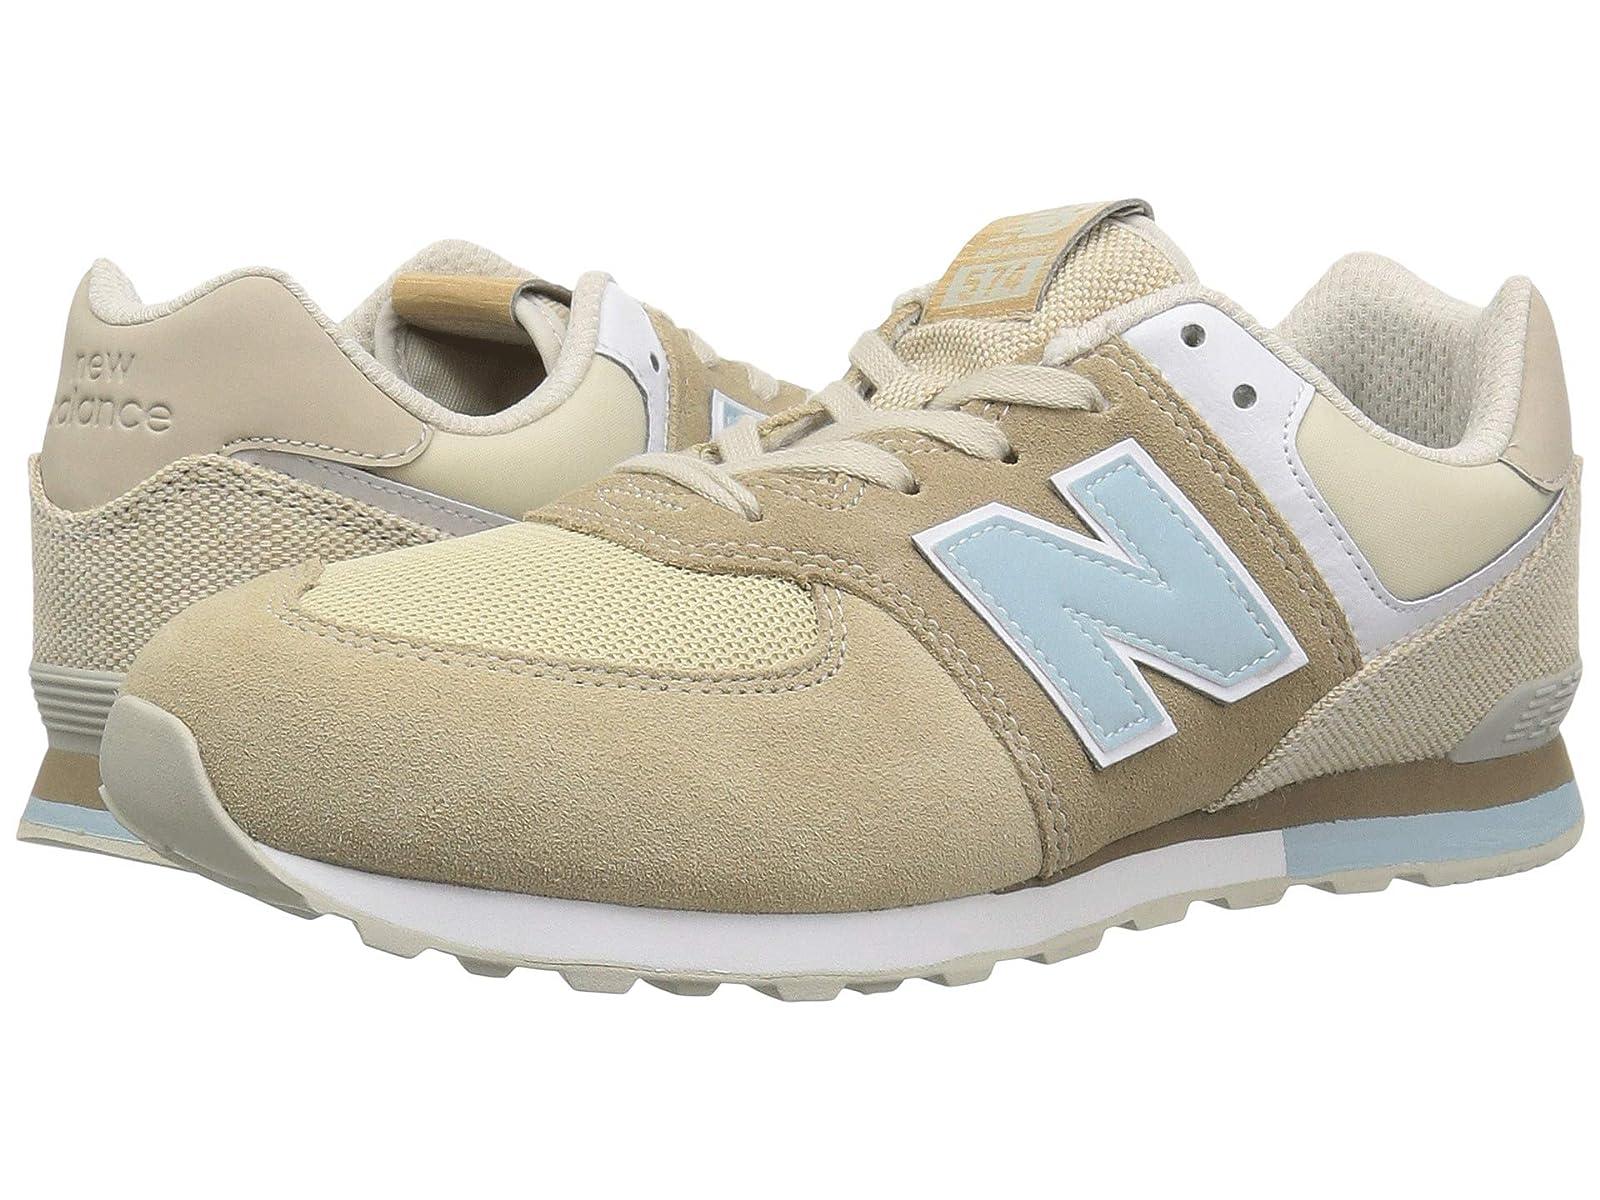 New Balance Kids GC574v1 (Big Kid)Cheap and distinctive eye-catching shoes